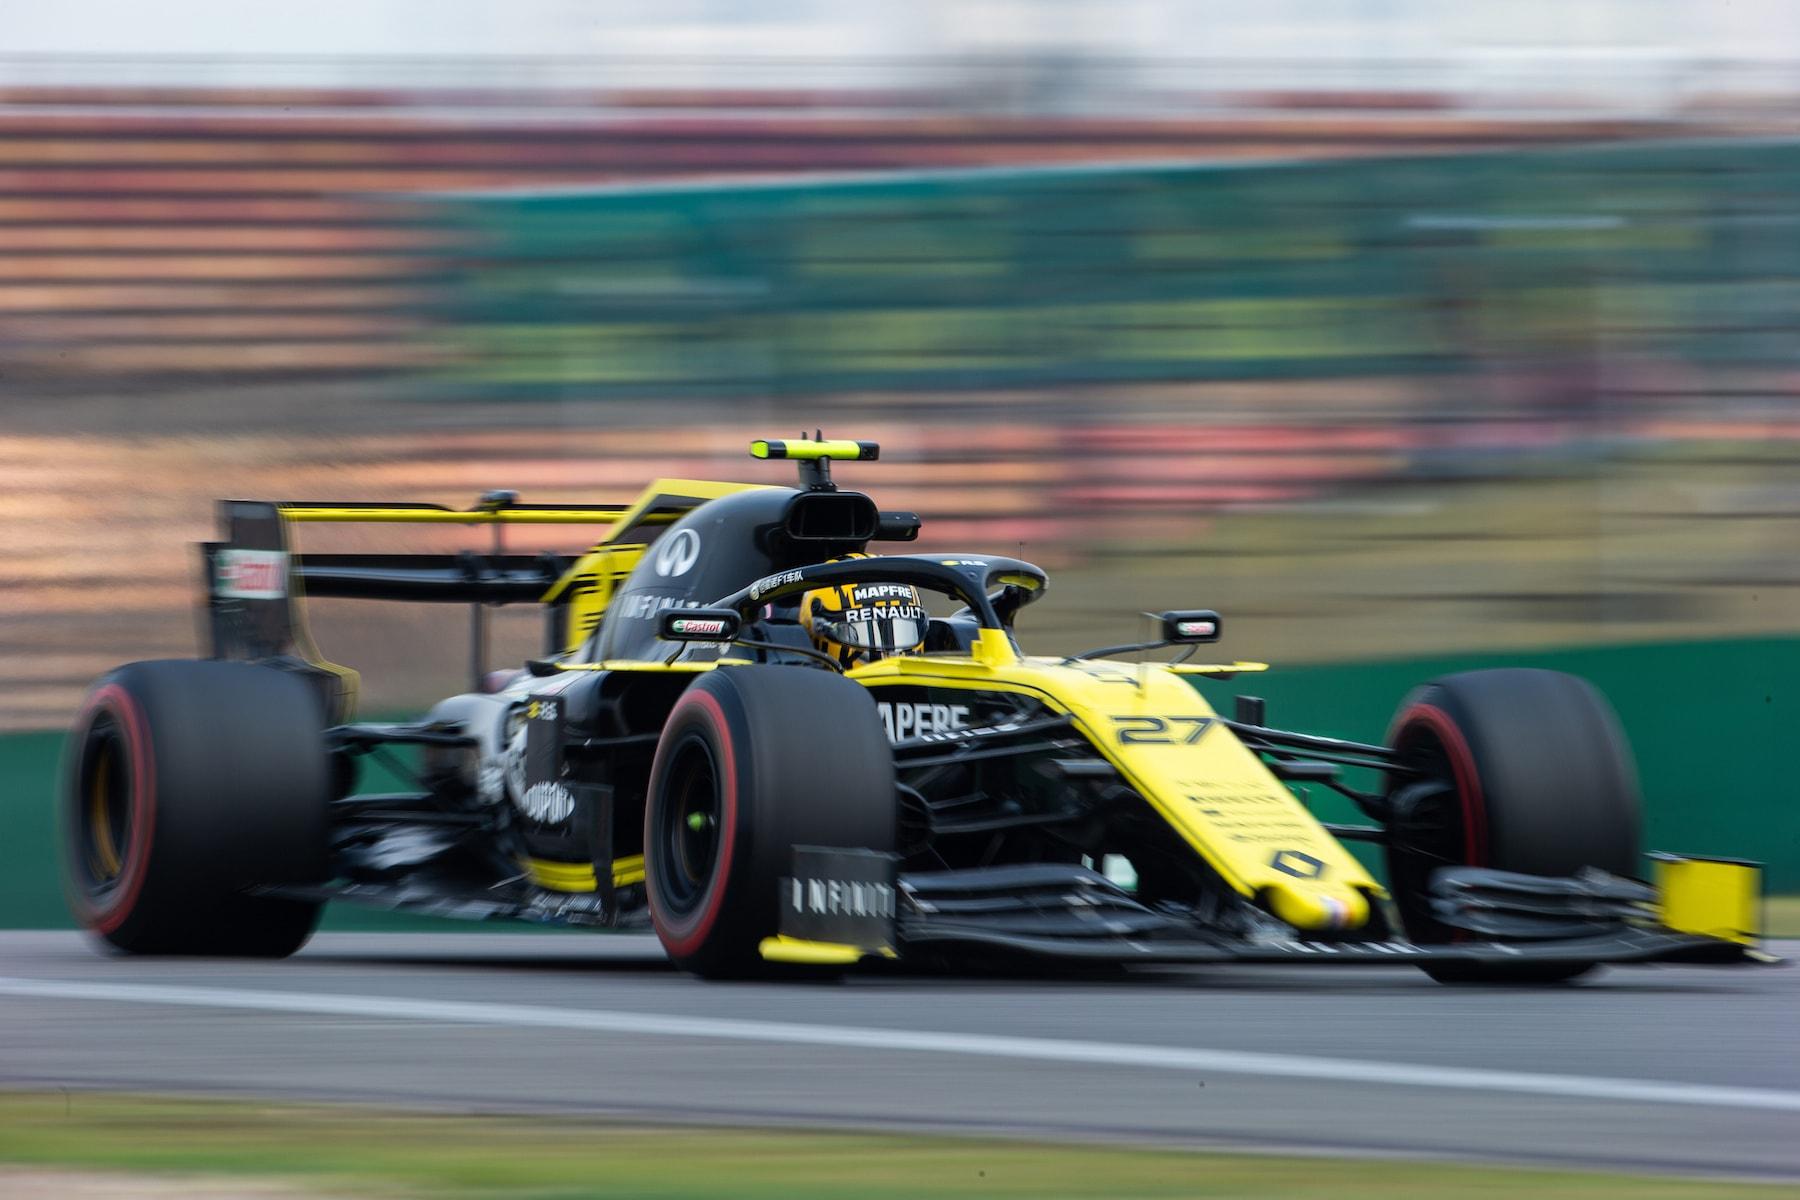 2 2019 Nico Hulkenberg | Renault RS19 | 2019 Chinese GP Q 1 copy.jpg